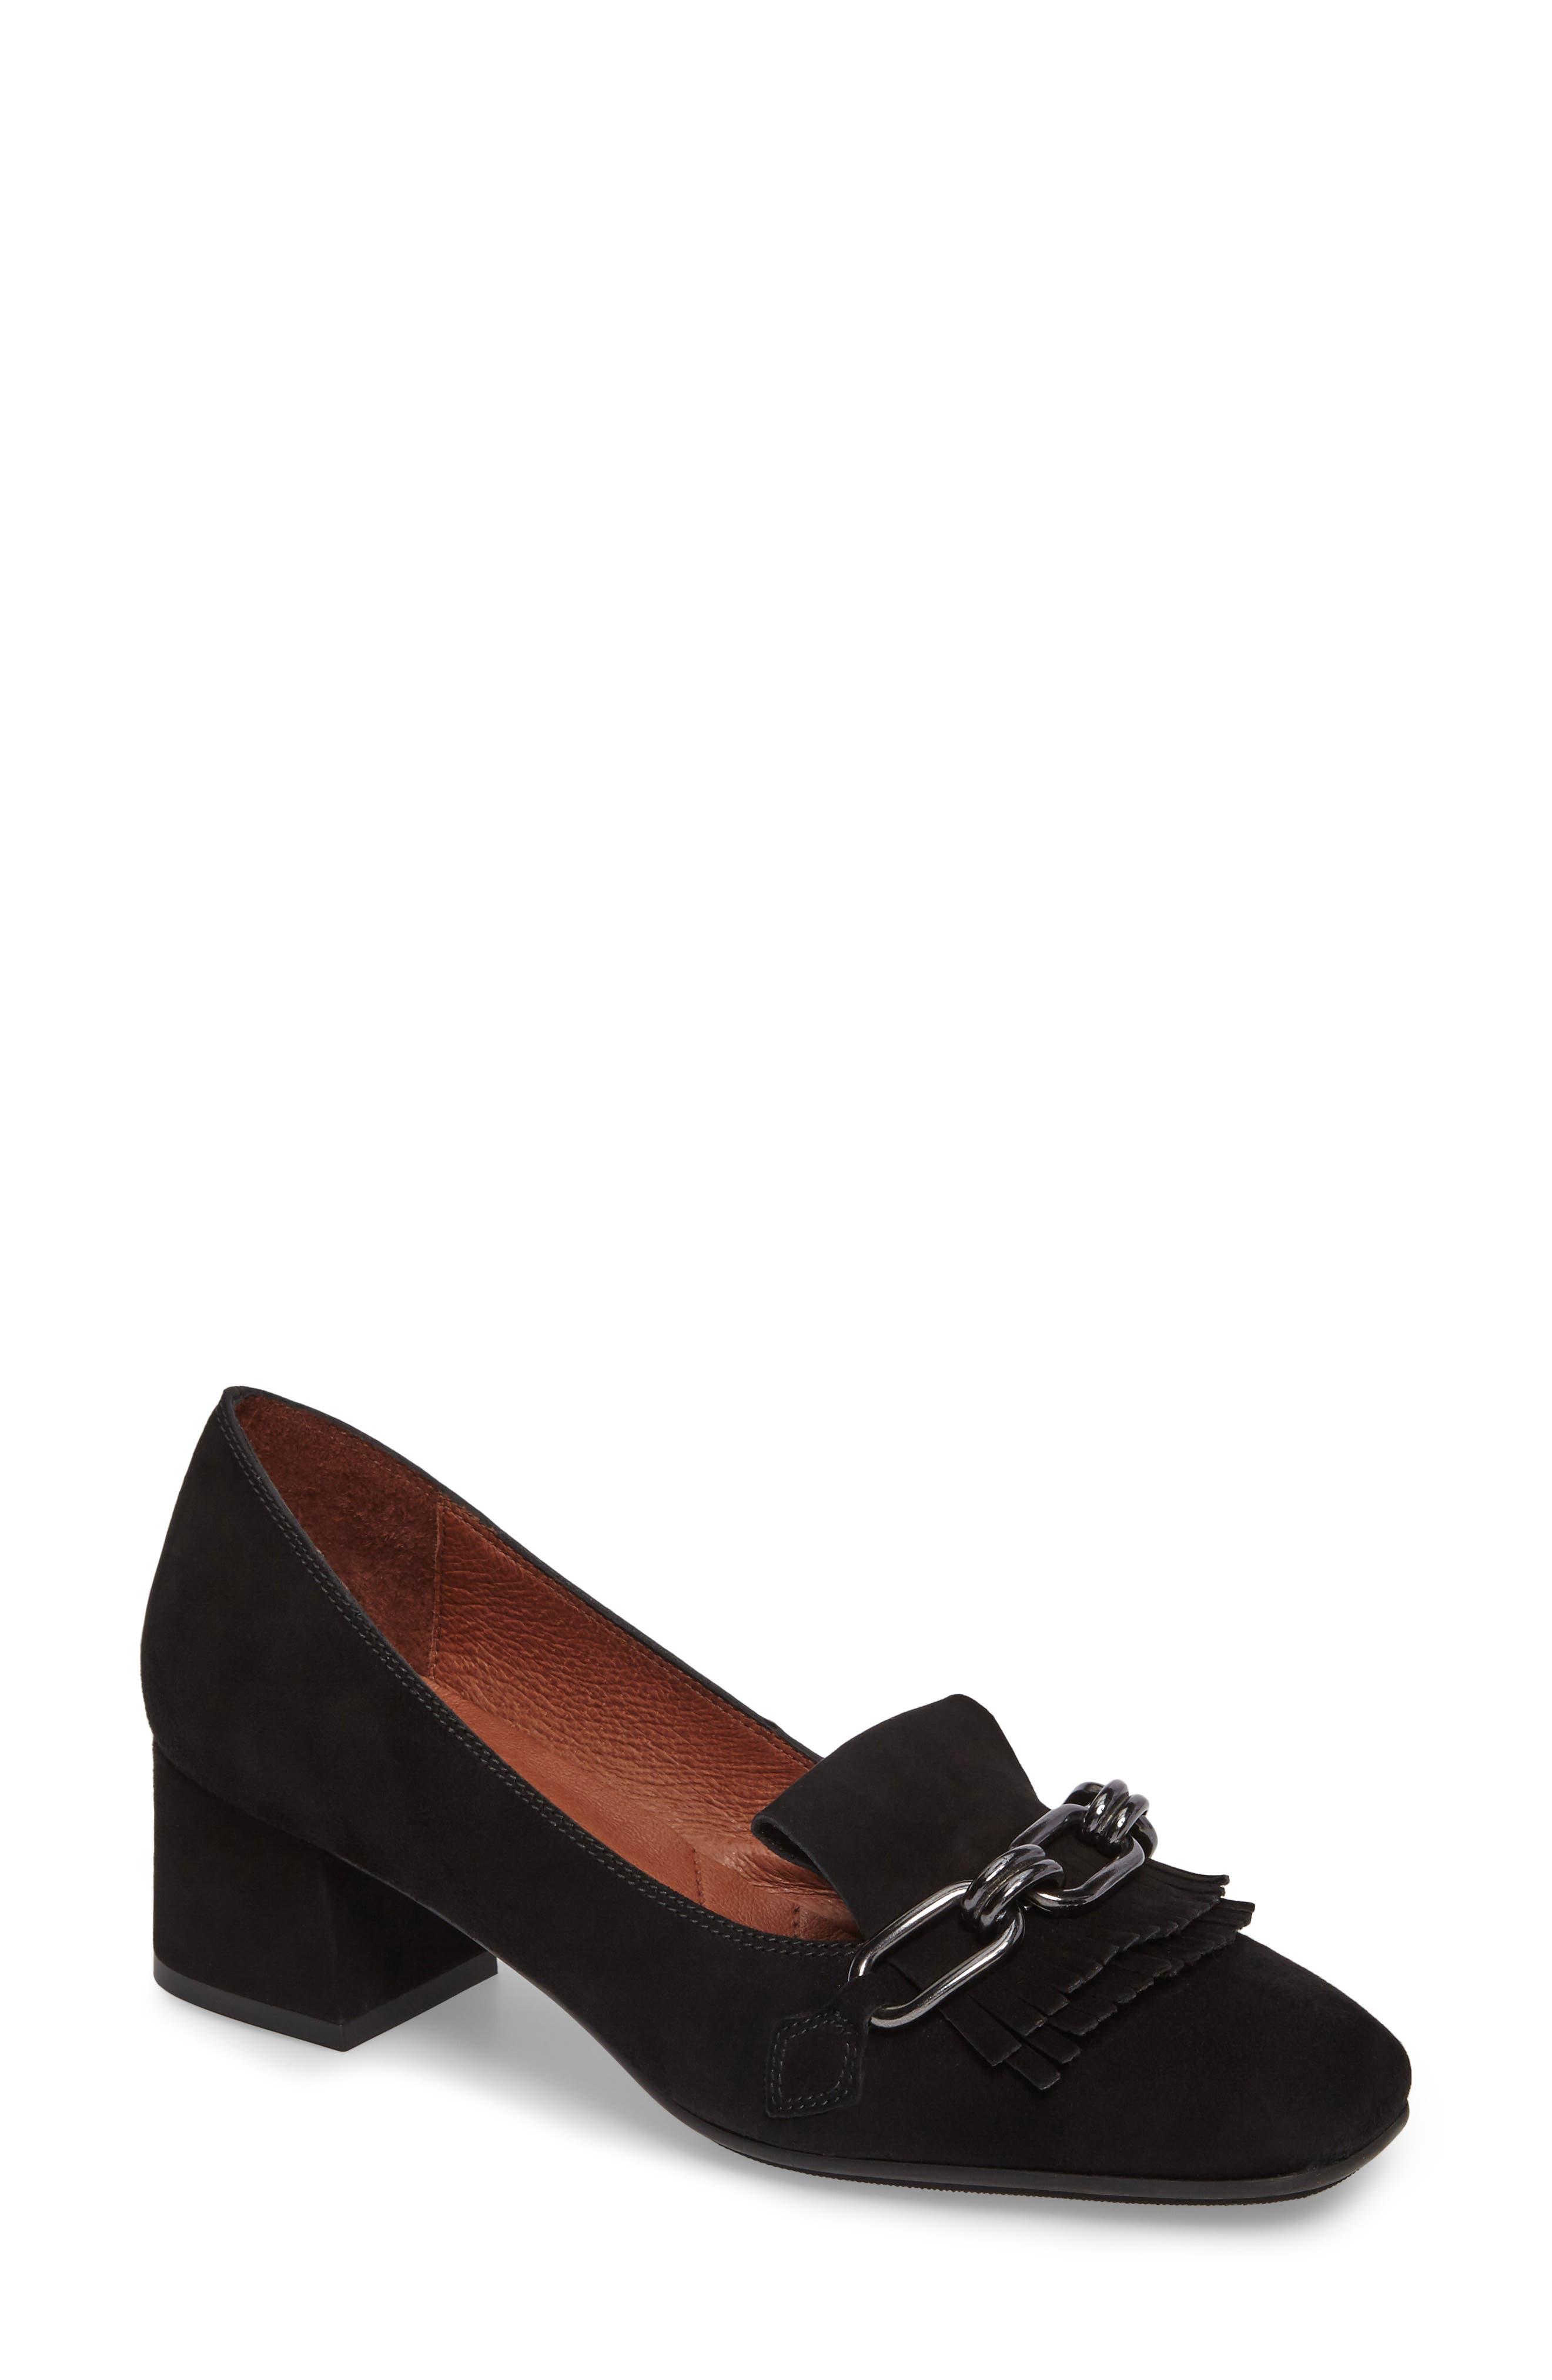 79df6002d037 Women s Hispanitas Shoes Sale